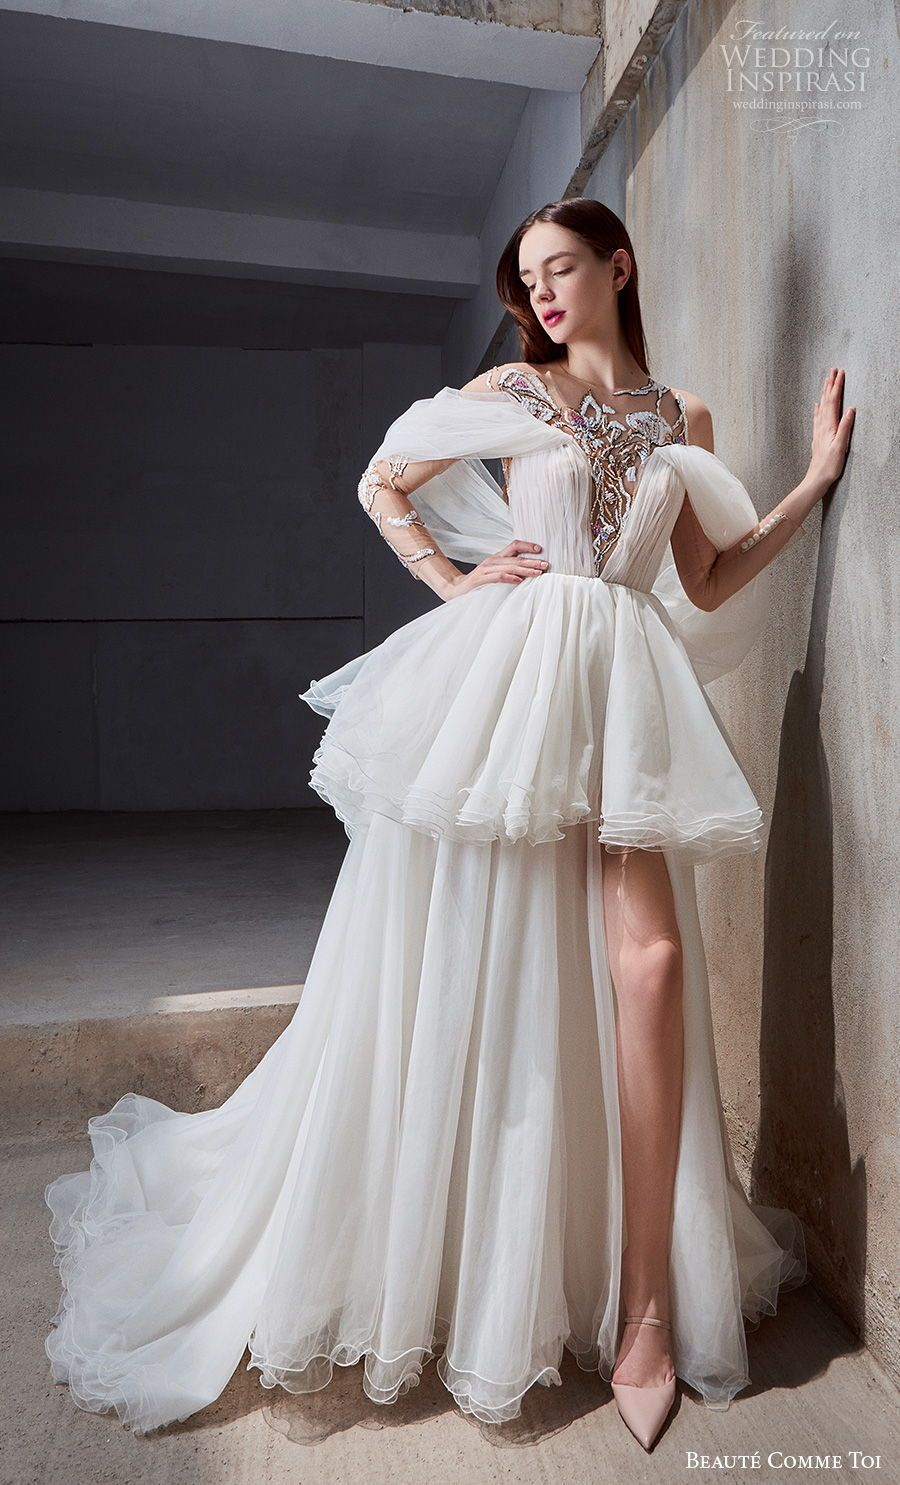 Beaute Comme Toi Spring Summer 2021 Wedding Dresses Chandelier Bridal Collection Wedding Inspirasi Long Sleeve Wedding Gowns Gorgeous Wedding Dress Ball Gowns Wedding [ 1485 x 900 Pixel ]